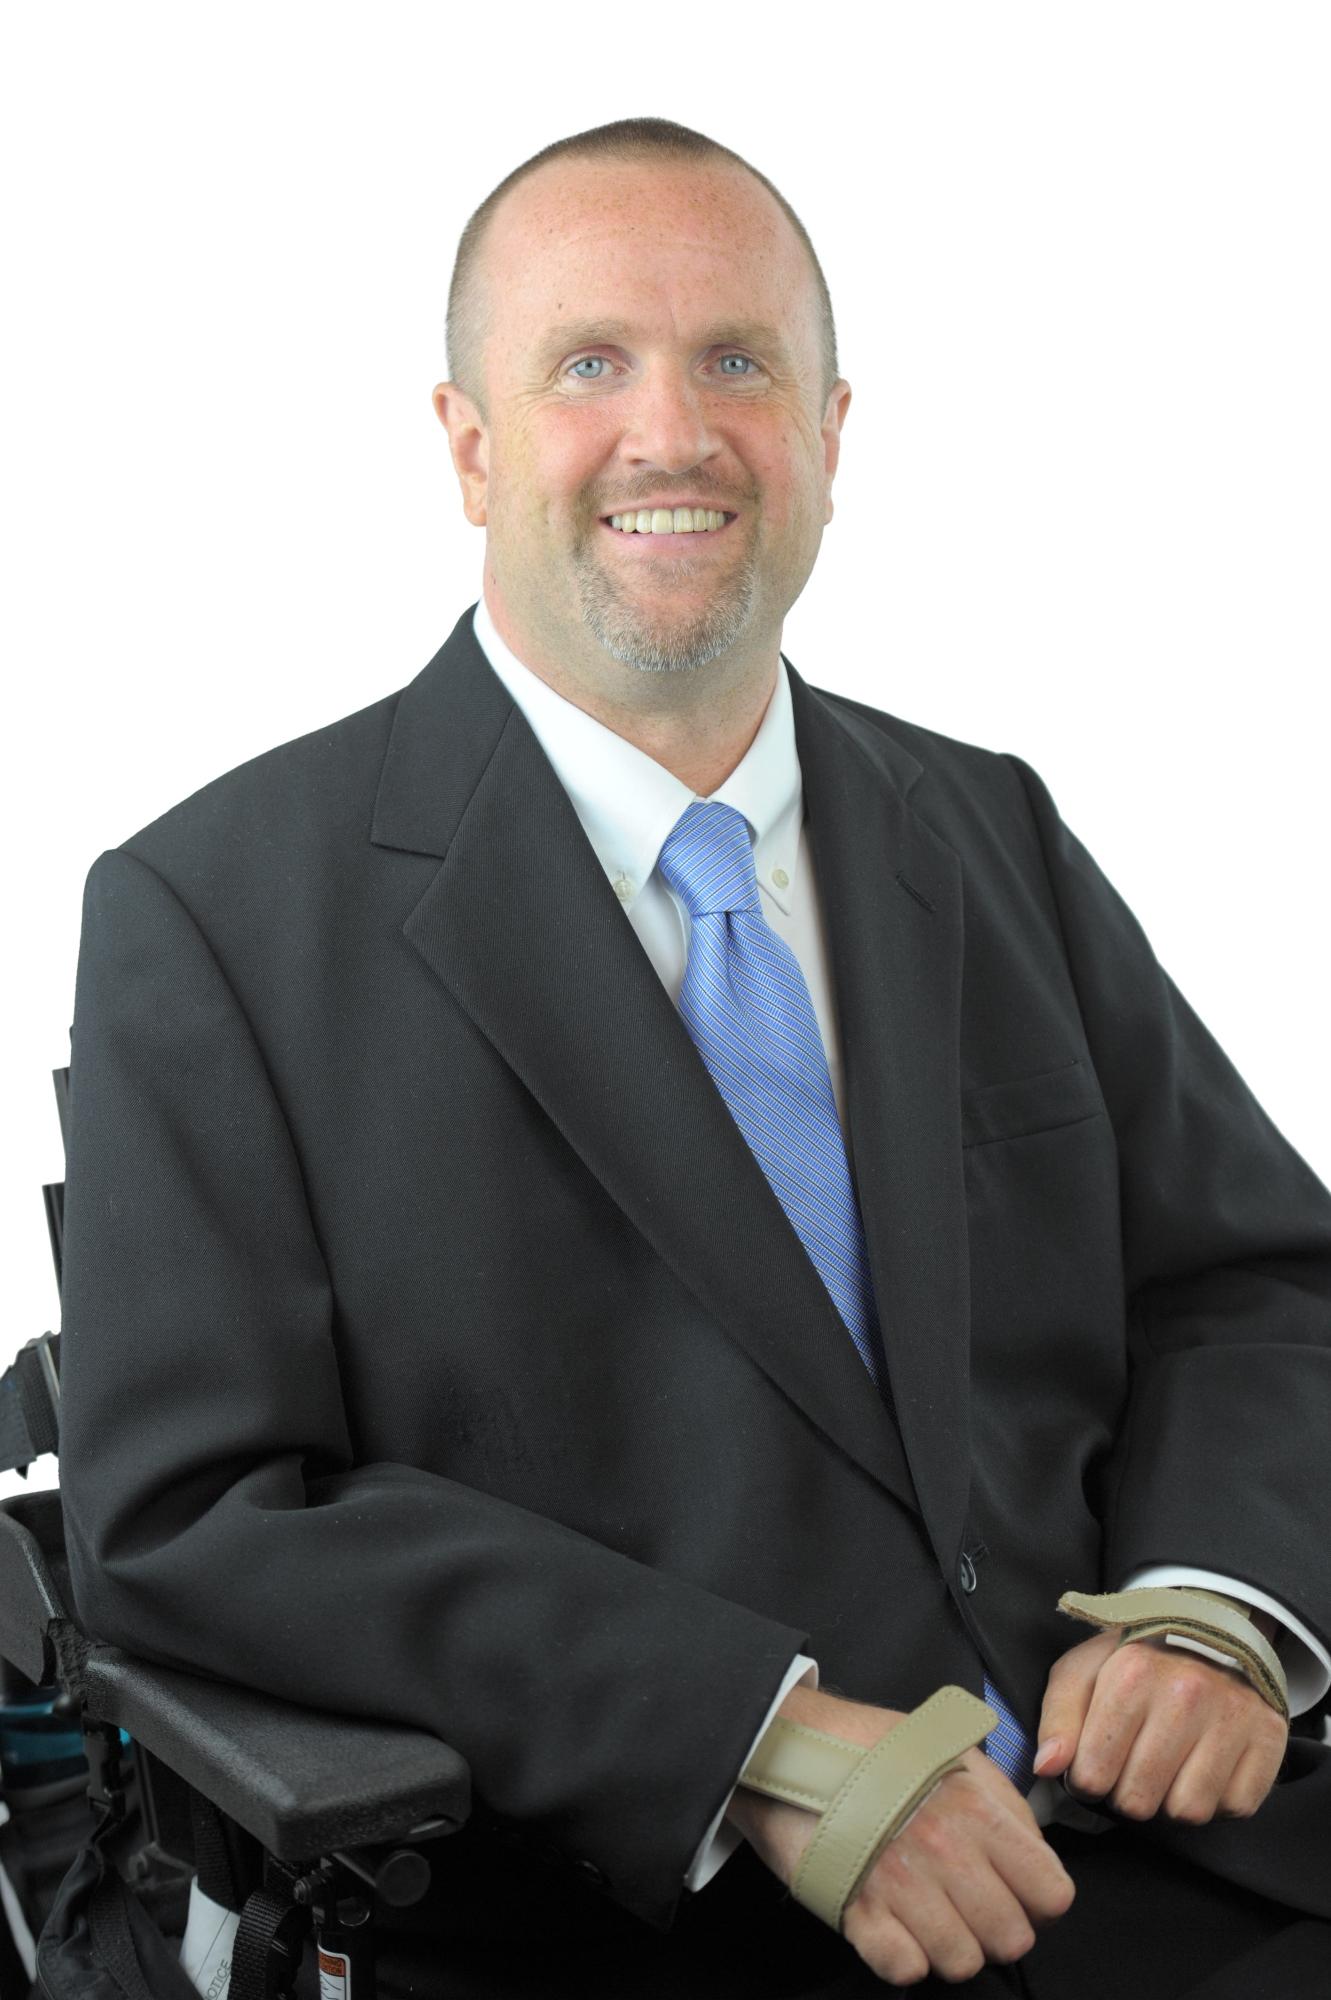 Chris Finn